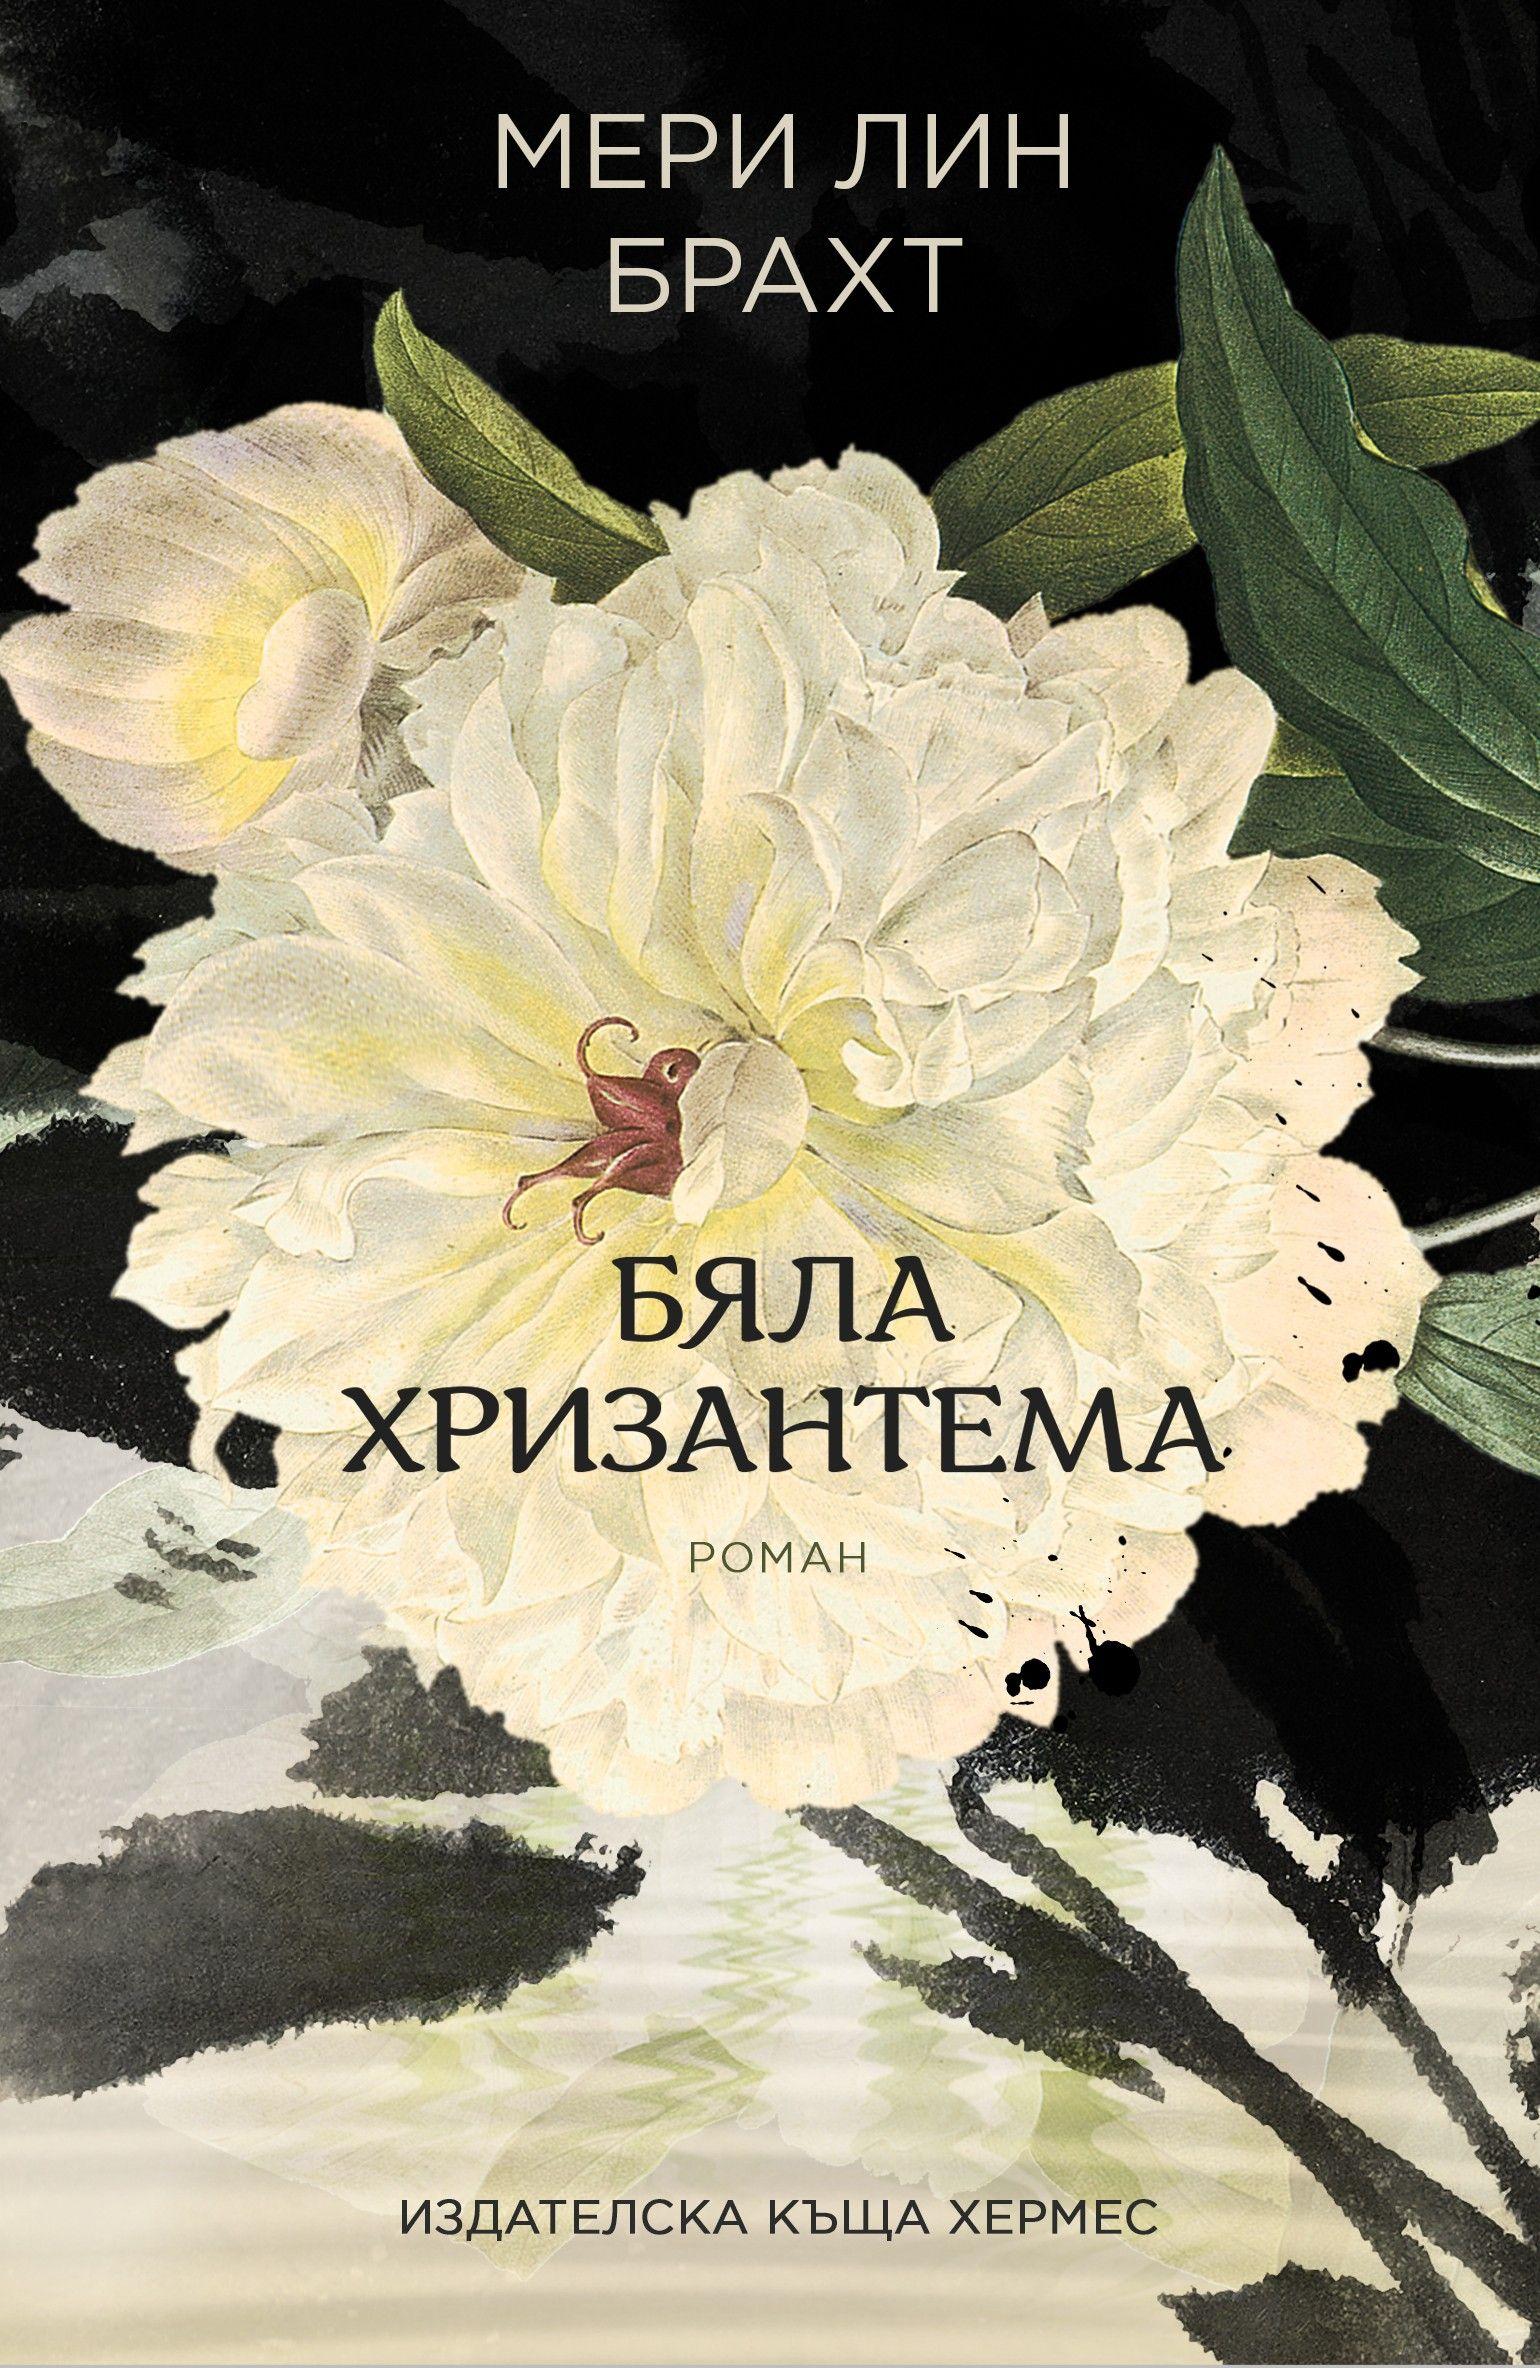 Бяла хризантема - 1